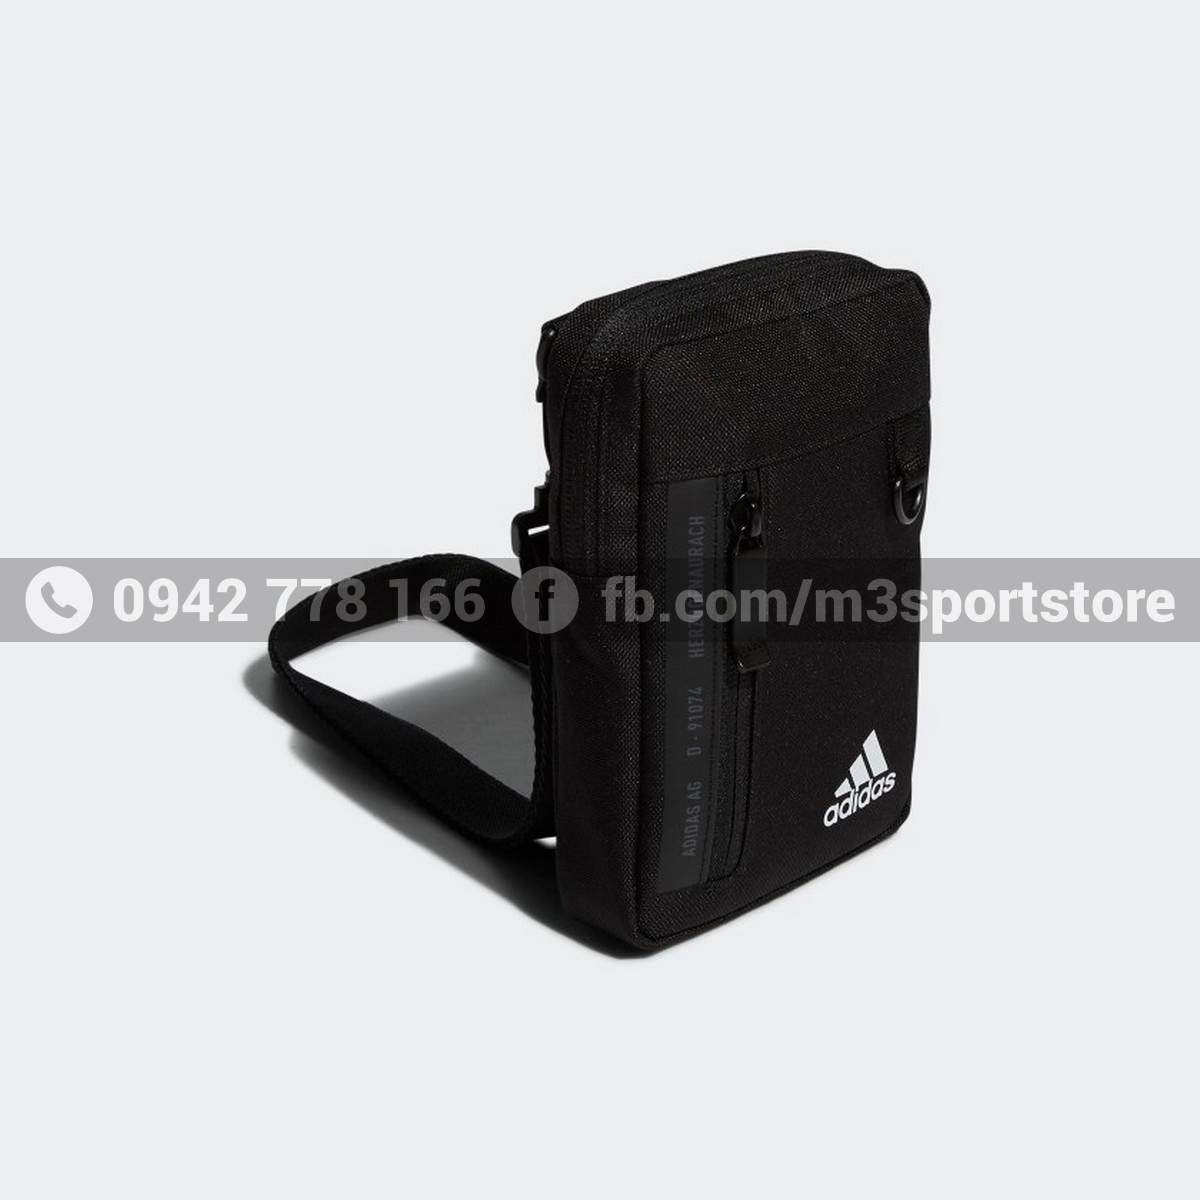 Túi thể thao Adidas New Classics Organiser GN9862